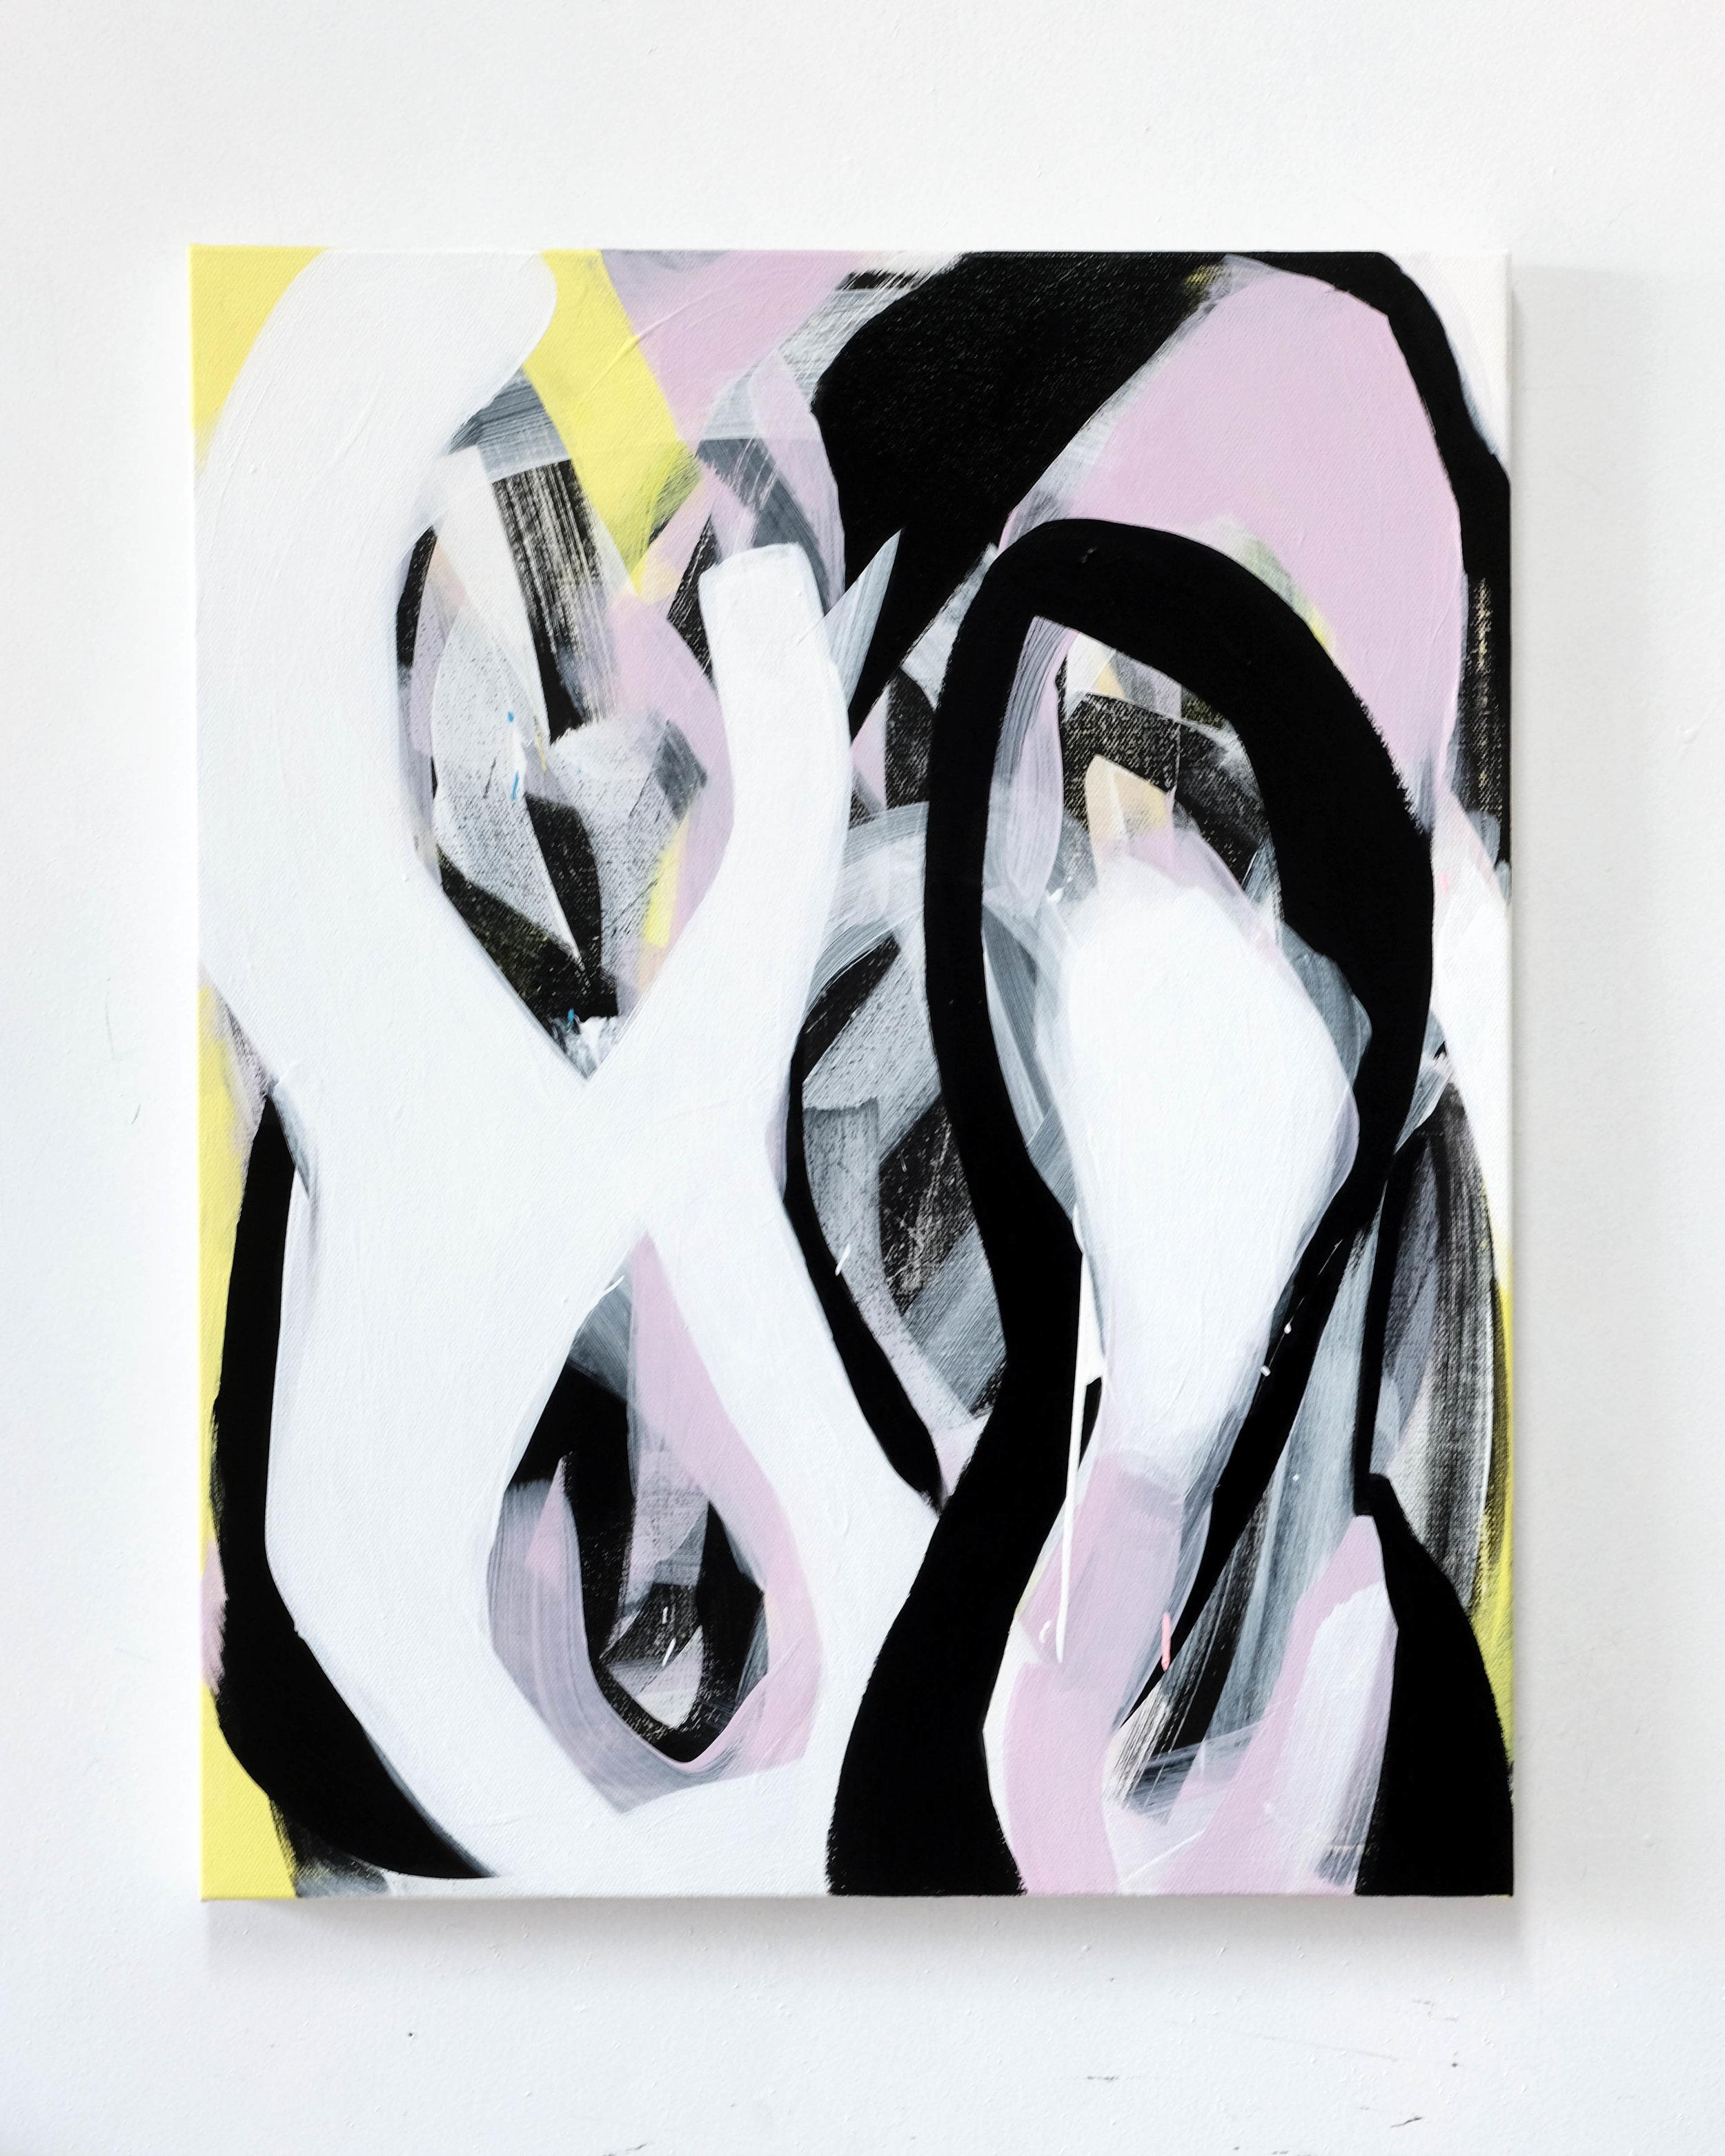 Navel Gazing, acrylic on canvas, 20x16in